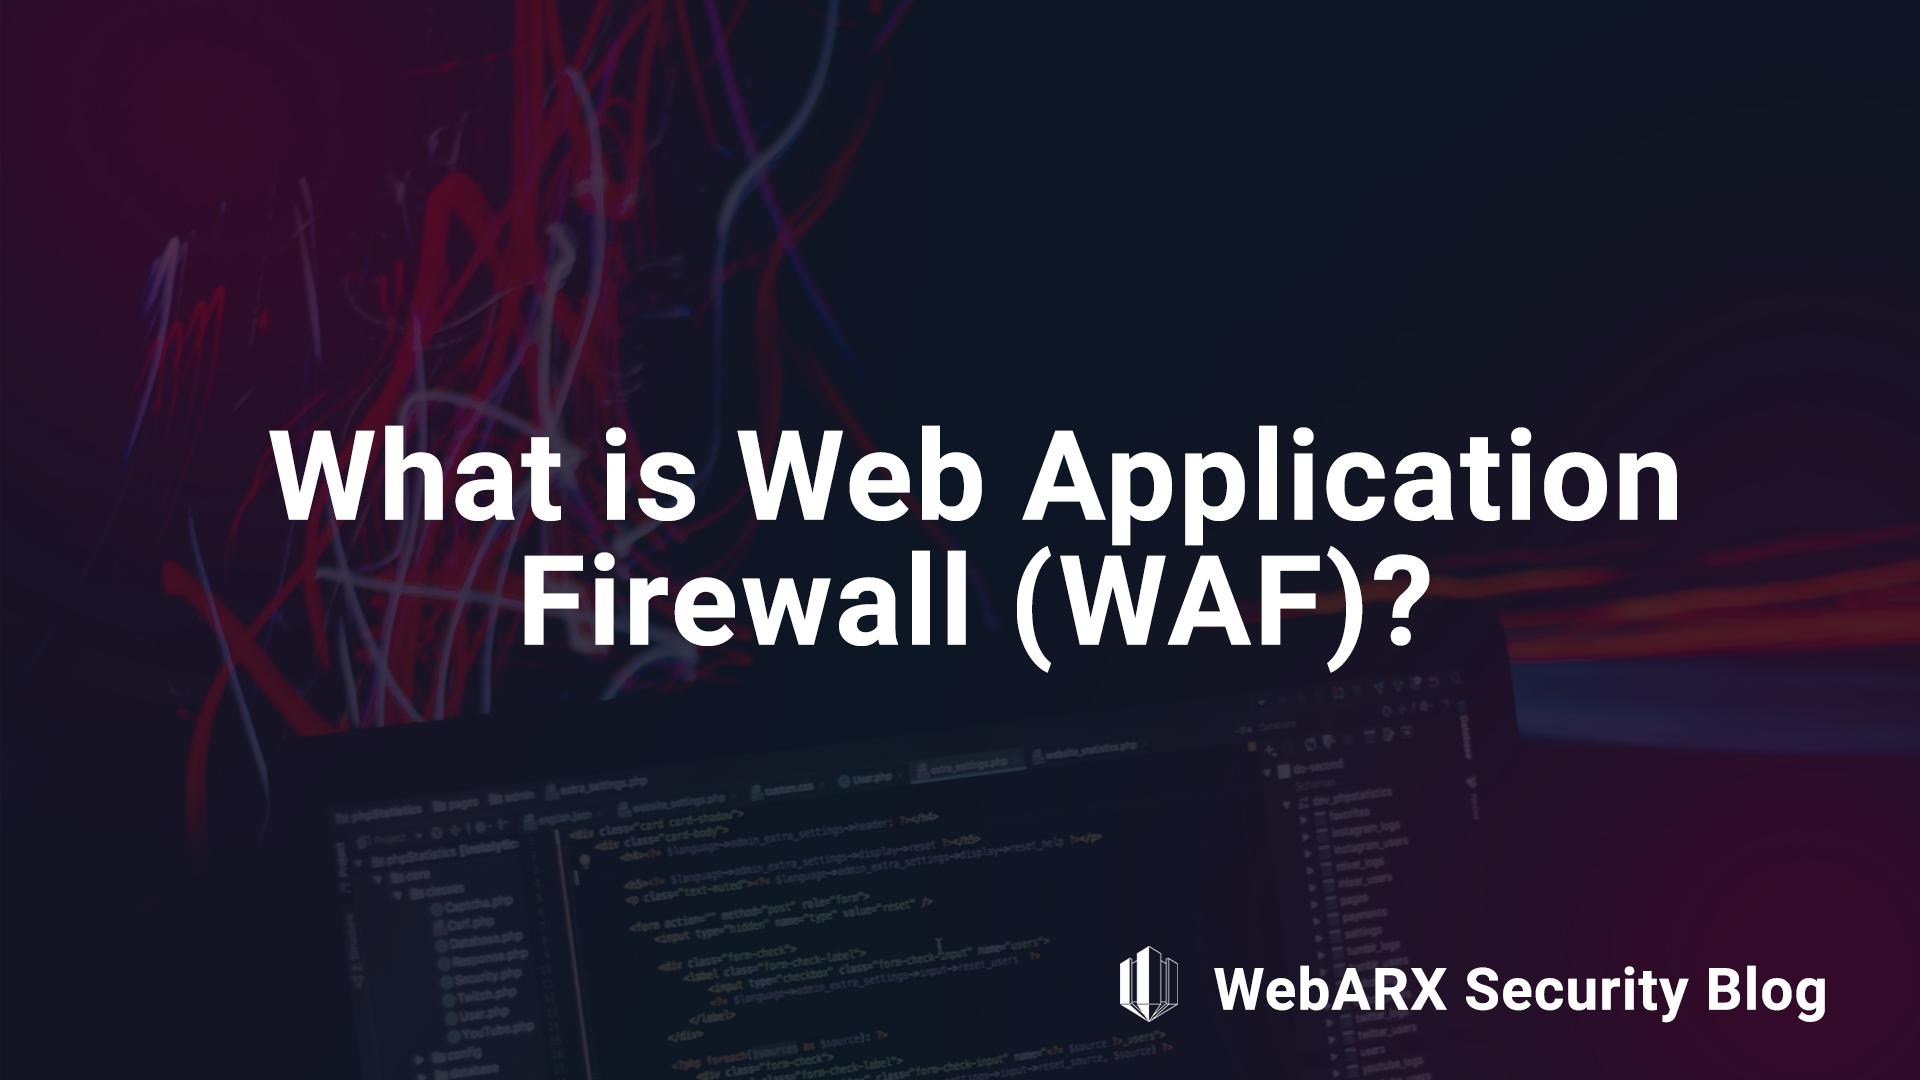 What is Web Application Firewall (WAF)? - WebARX Security